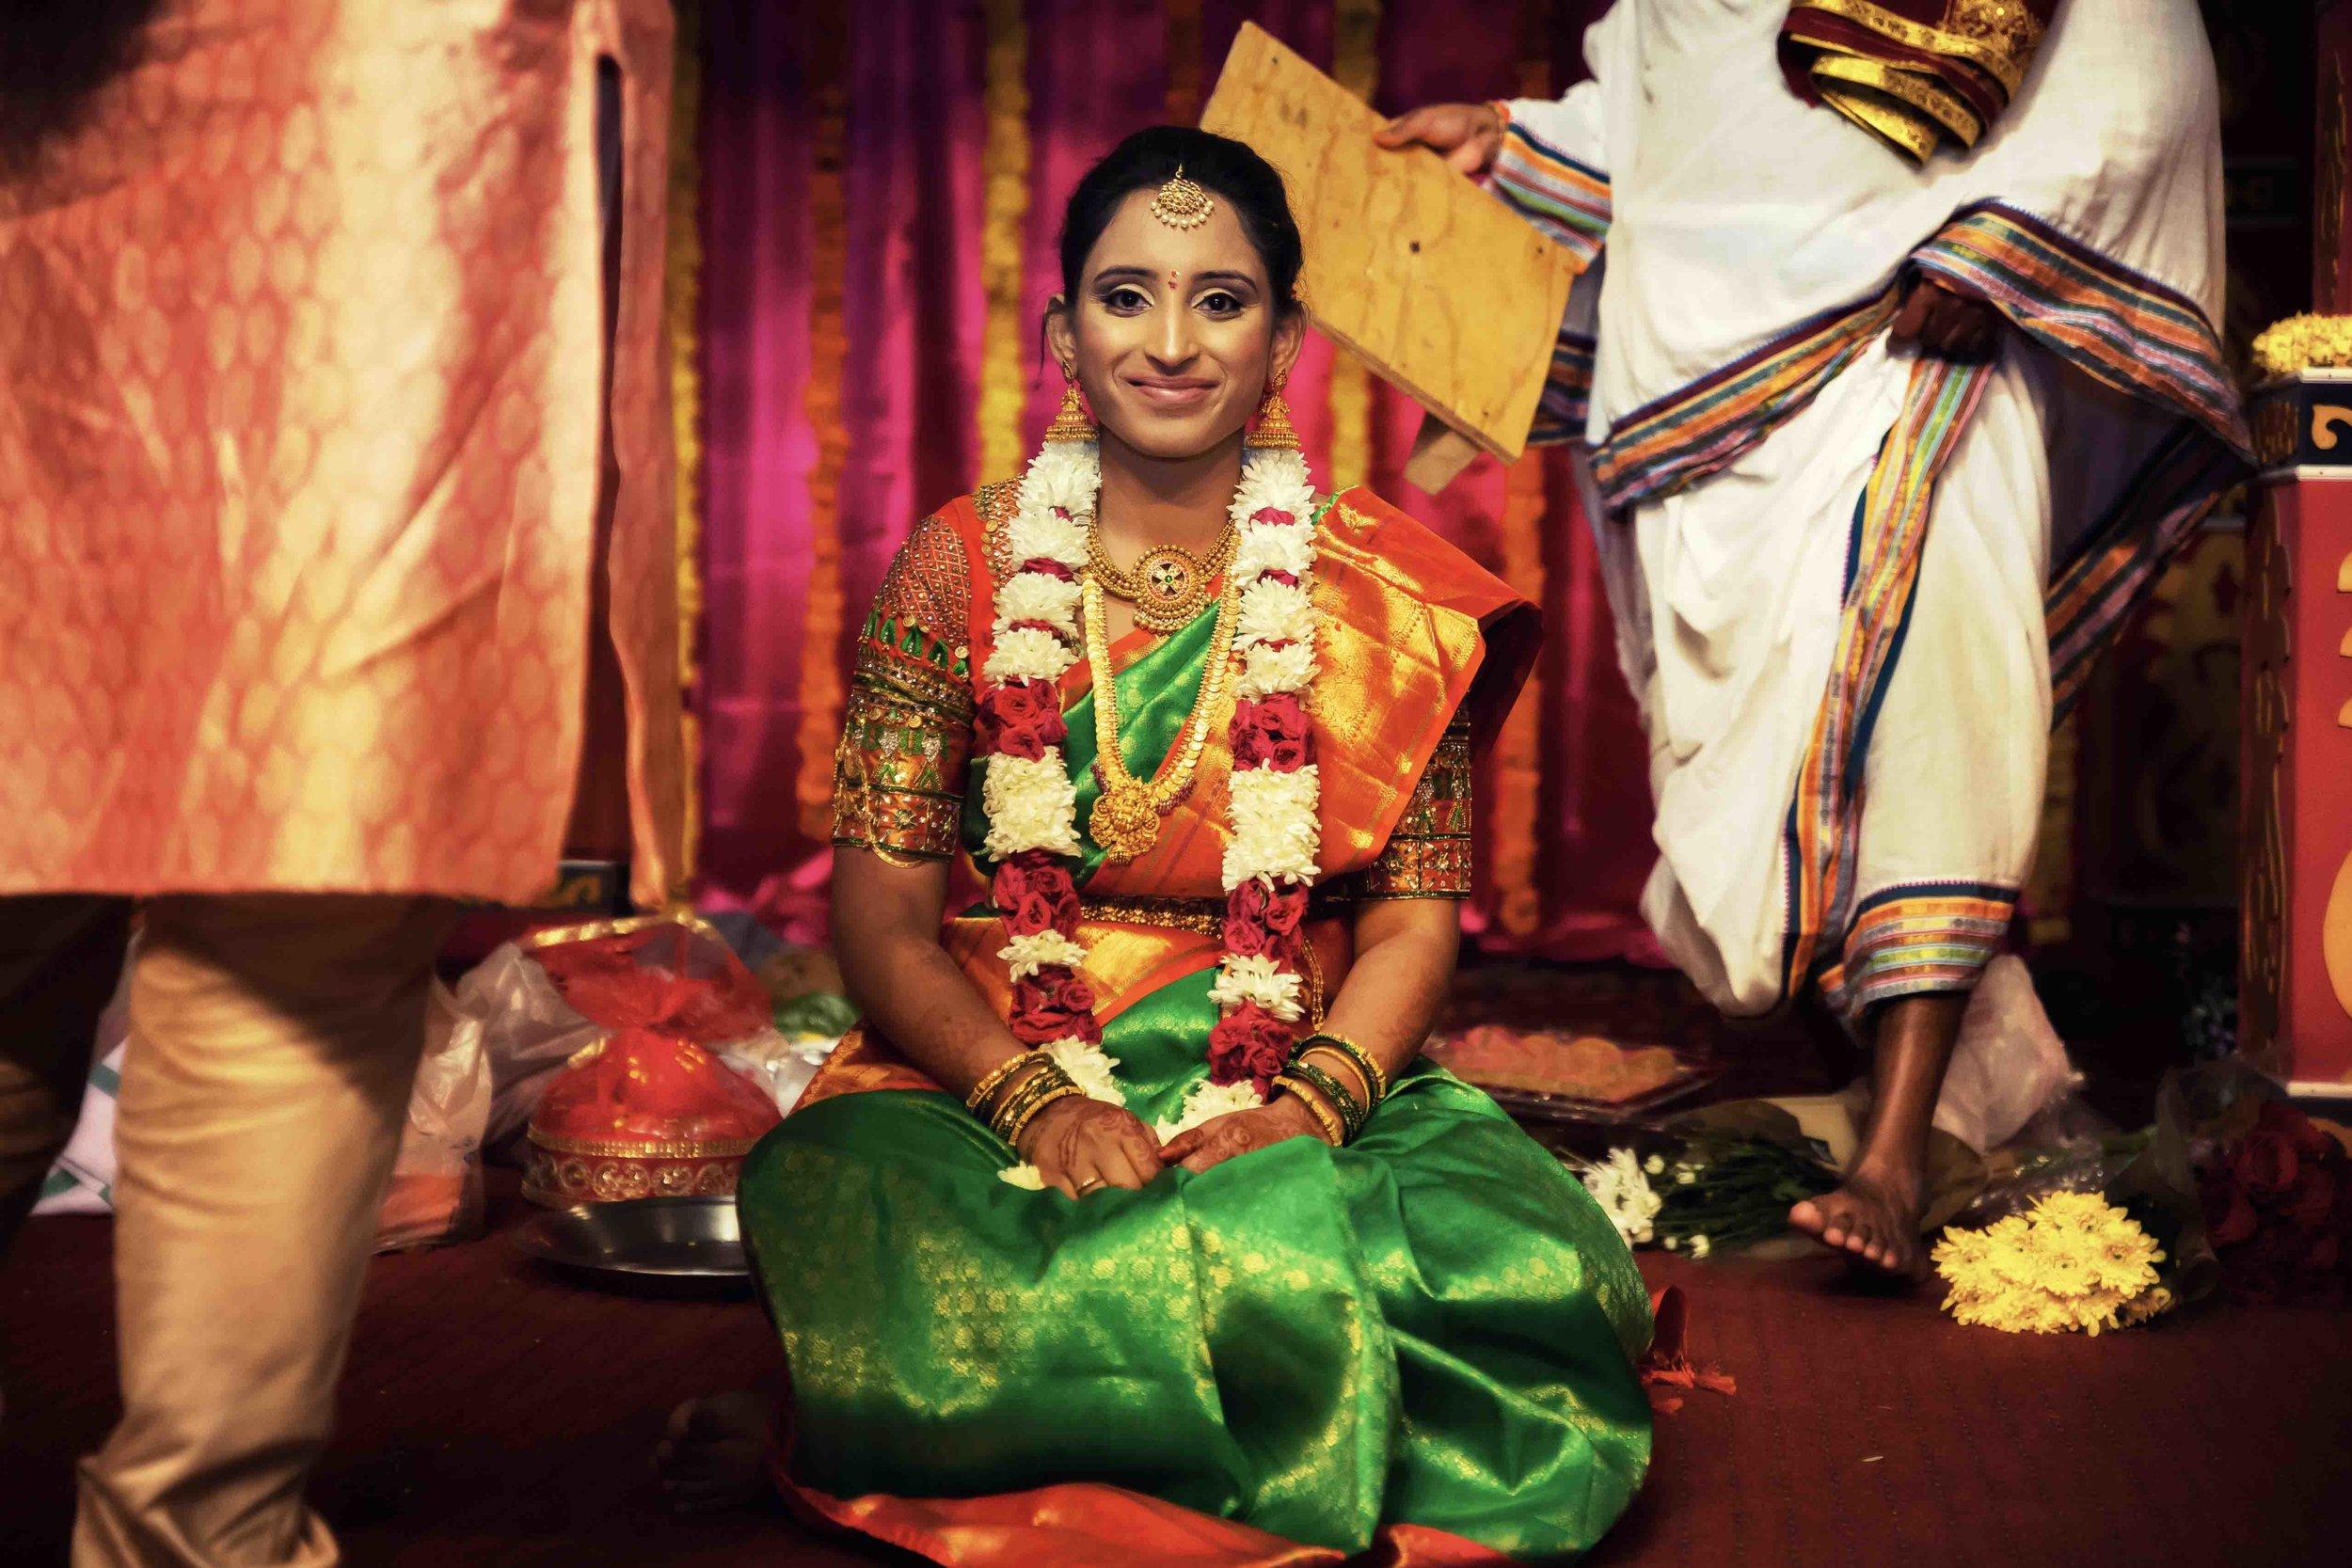 Indian Bride and Mandir Pooja wedding photographer in memphis collierville tn.jpg